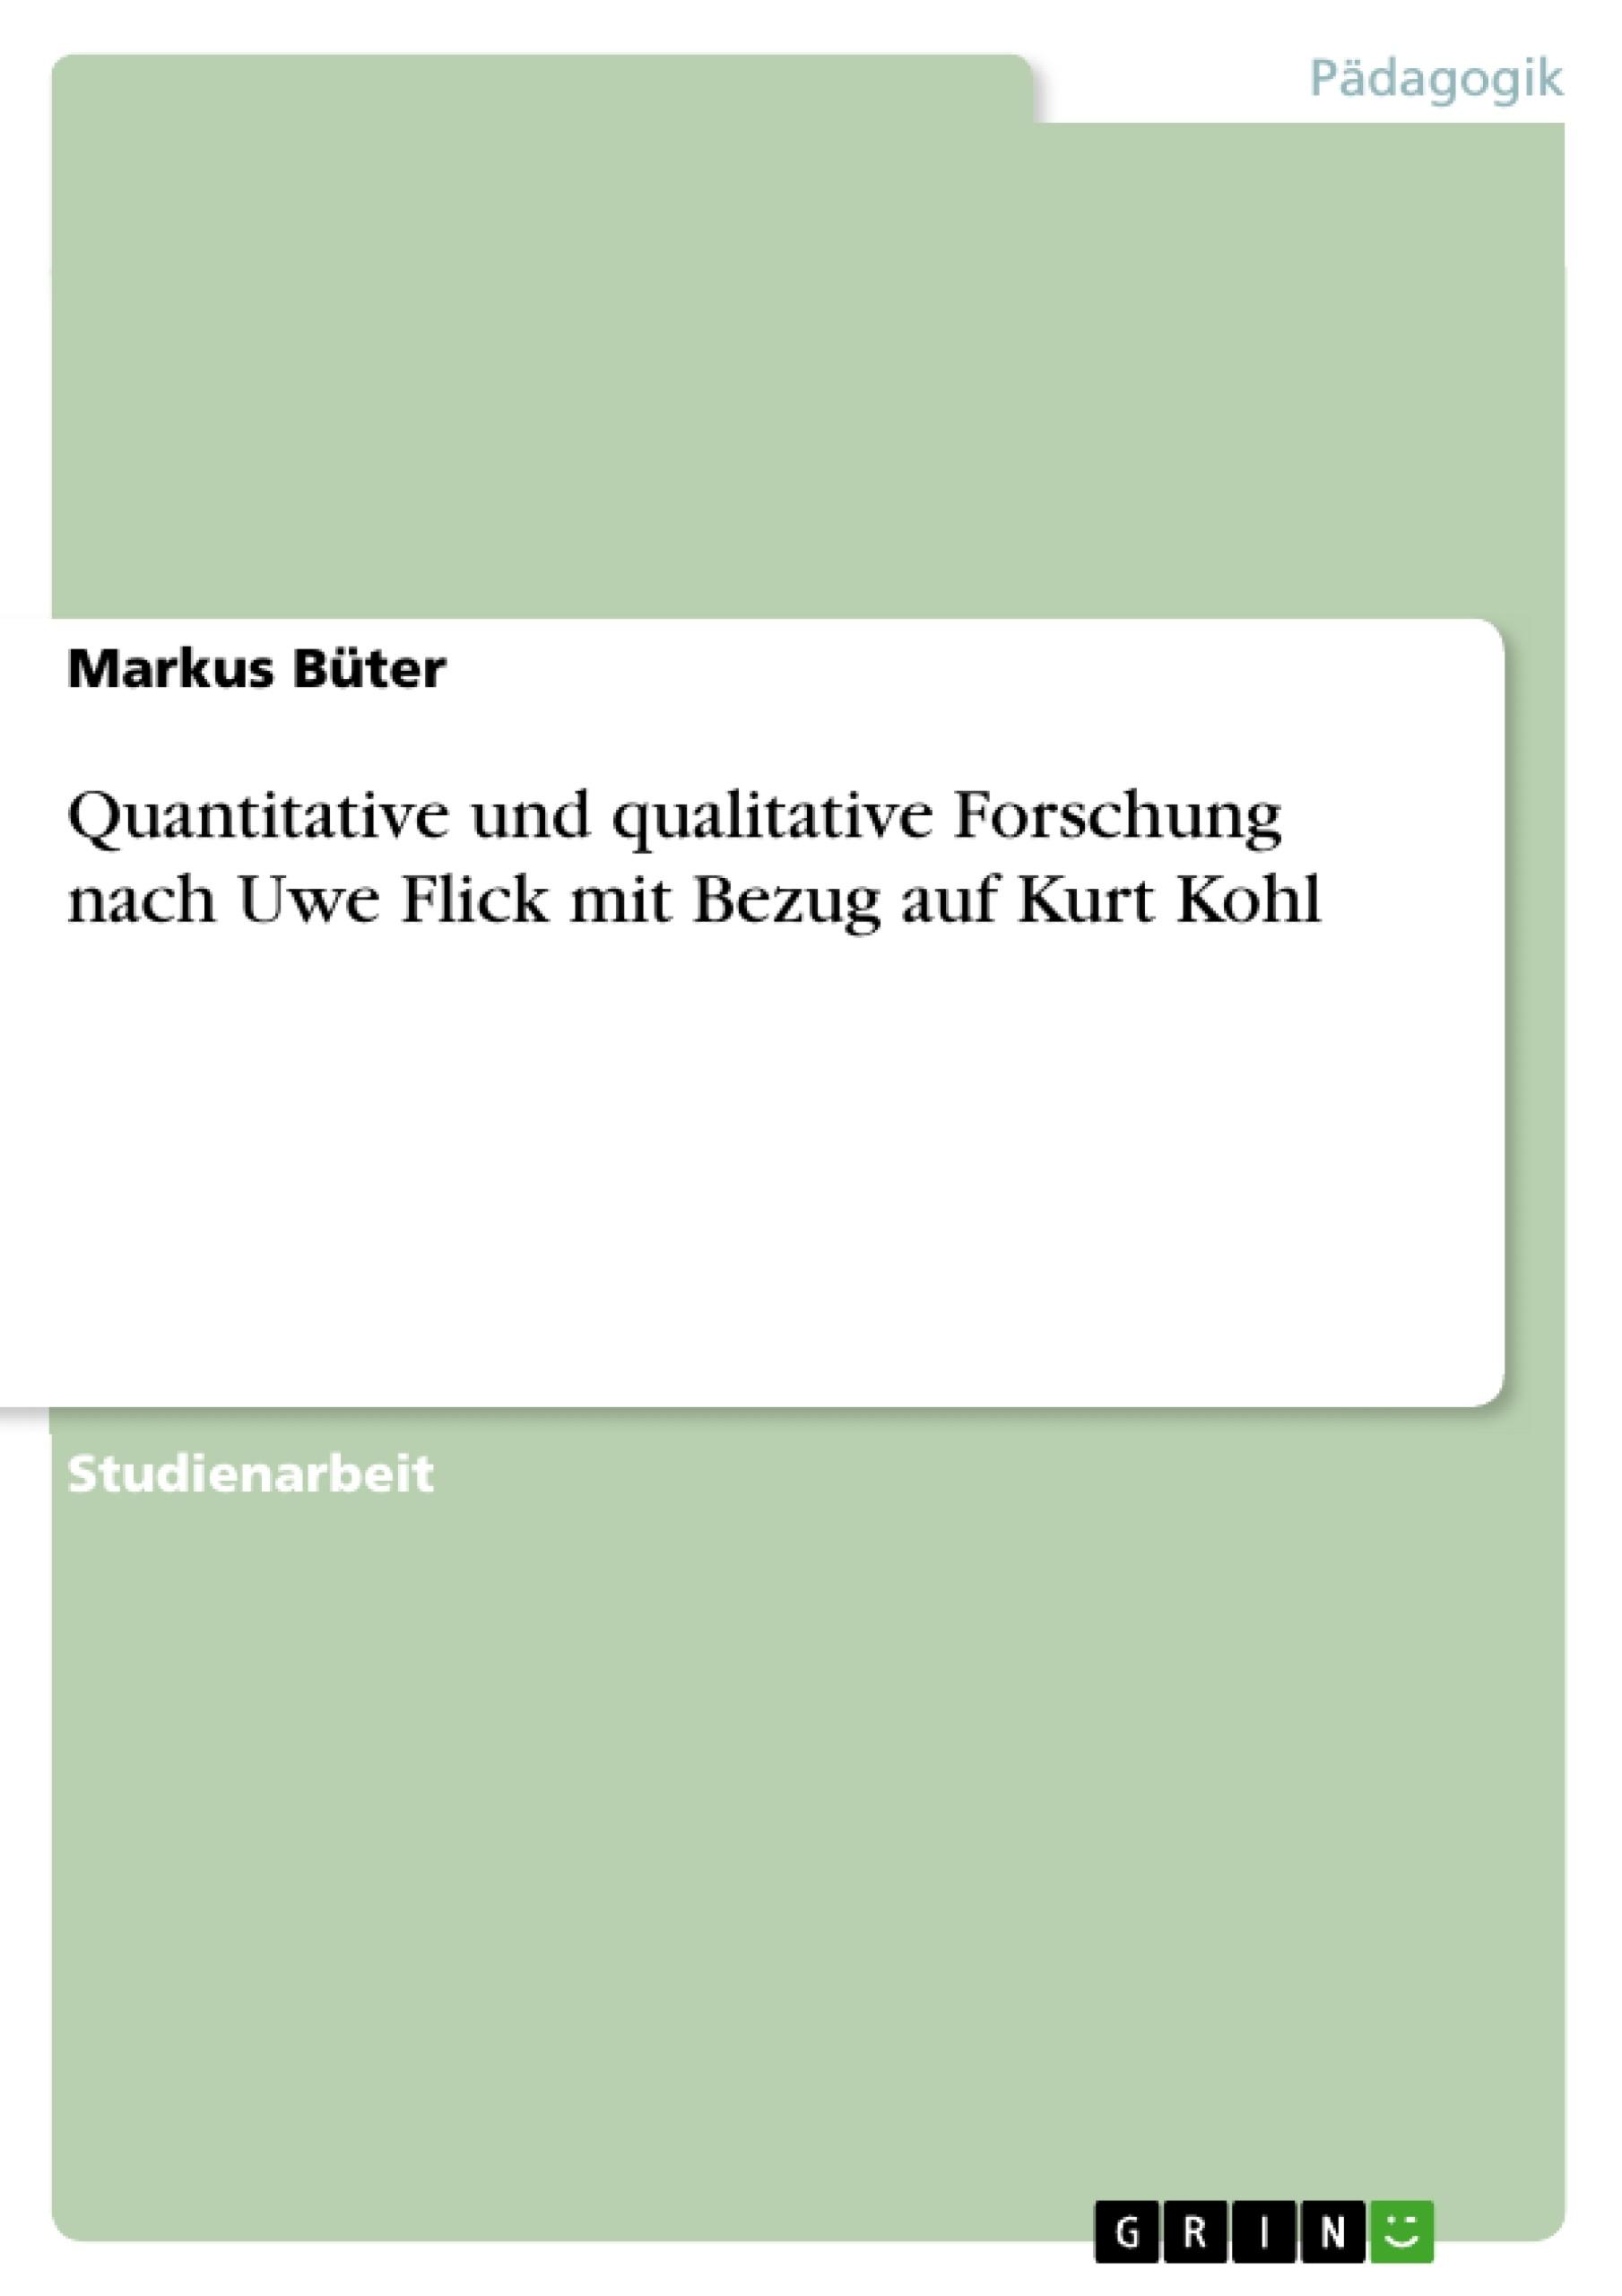 Titel: Quantitative und qualitative Forschung nach Uwe Flick mit Bezug auf Kurt Kohl